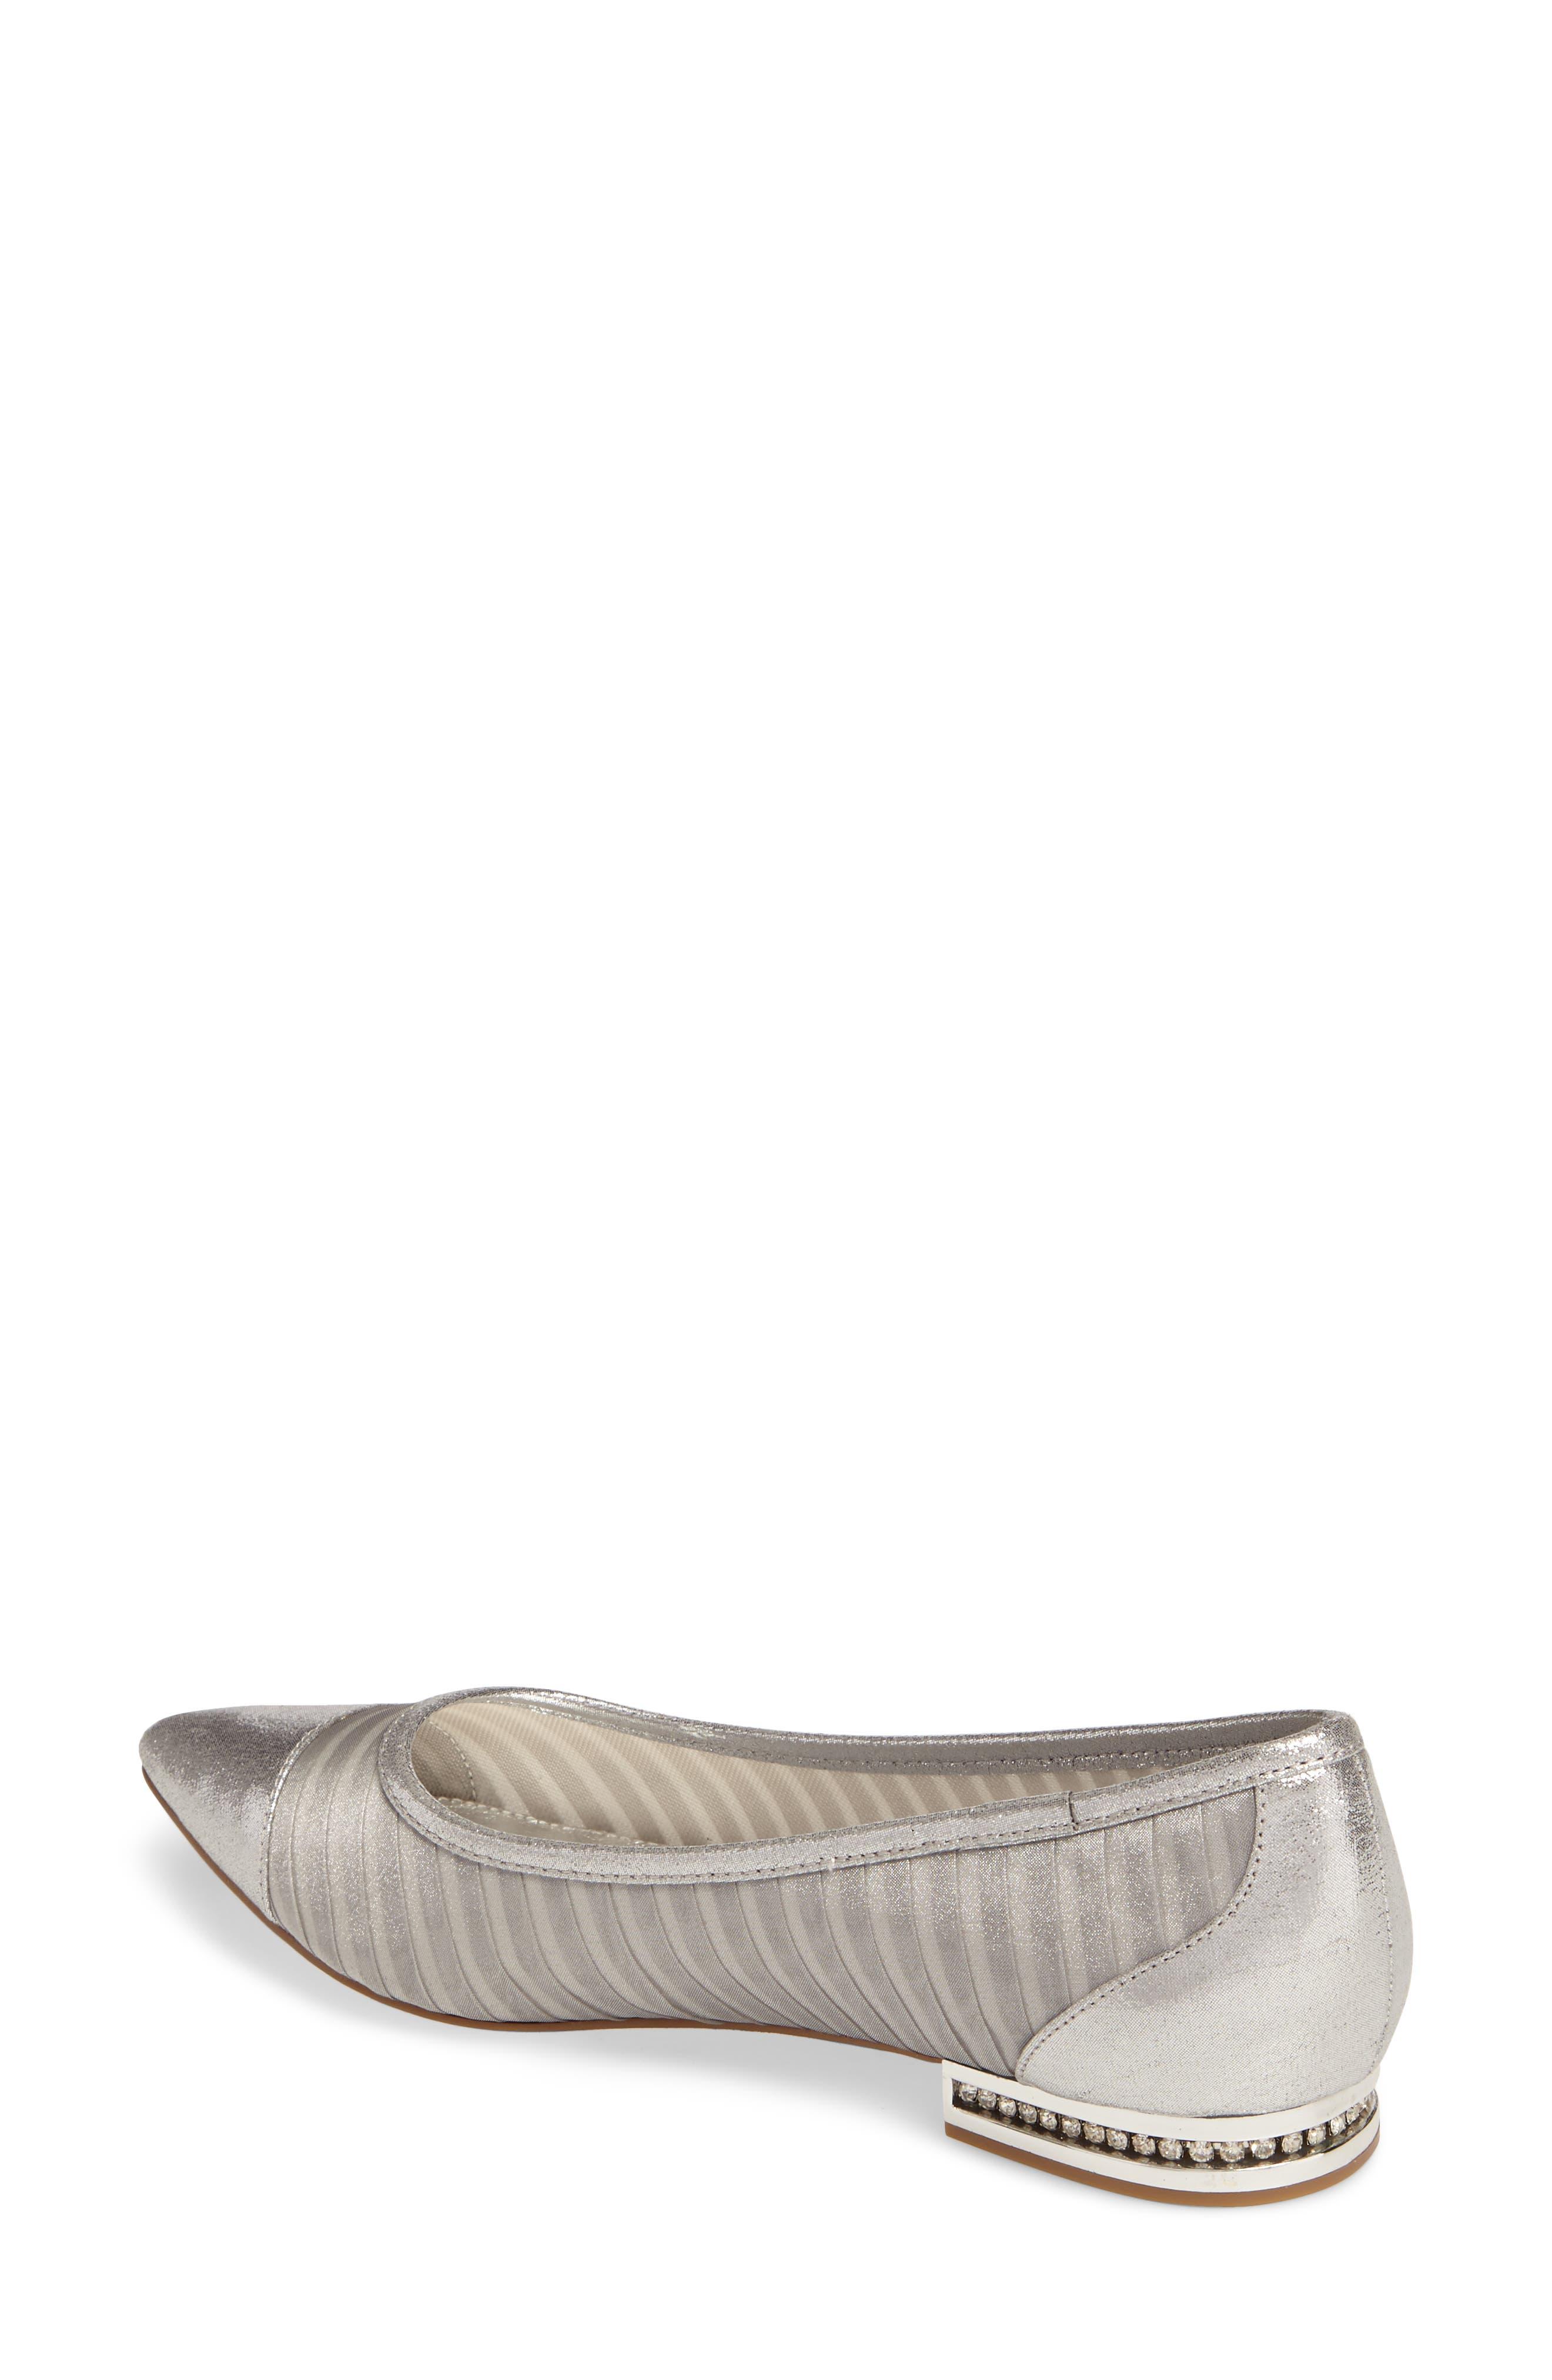 Tiffany Pointy Toe Flat,                             Alternate thumbnail 2, color,                             Silver Fabric